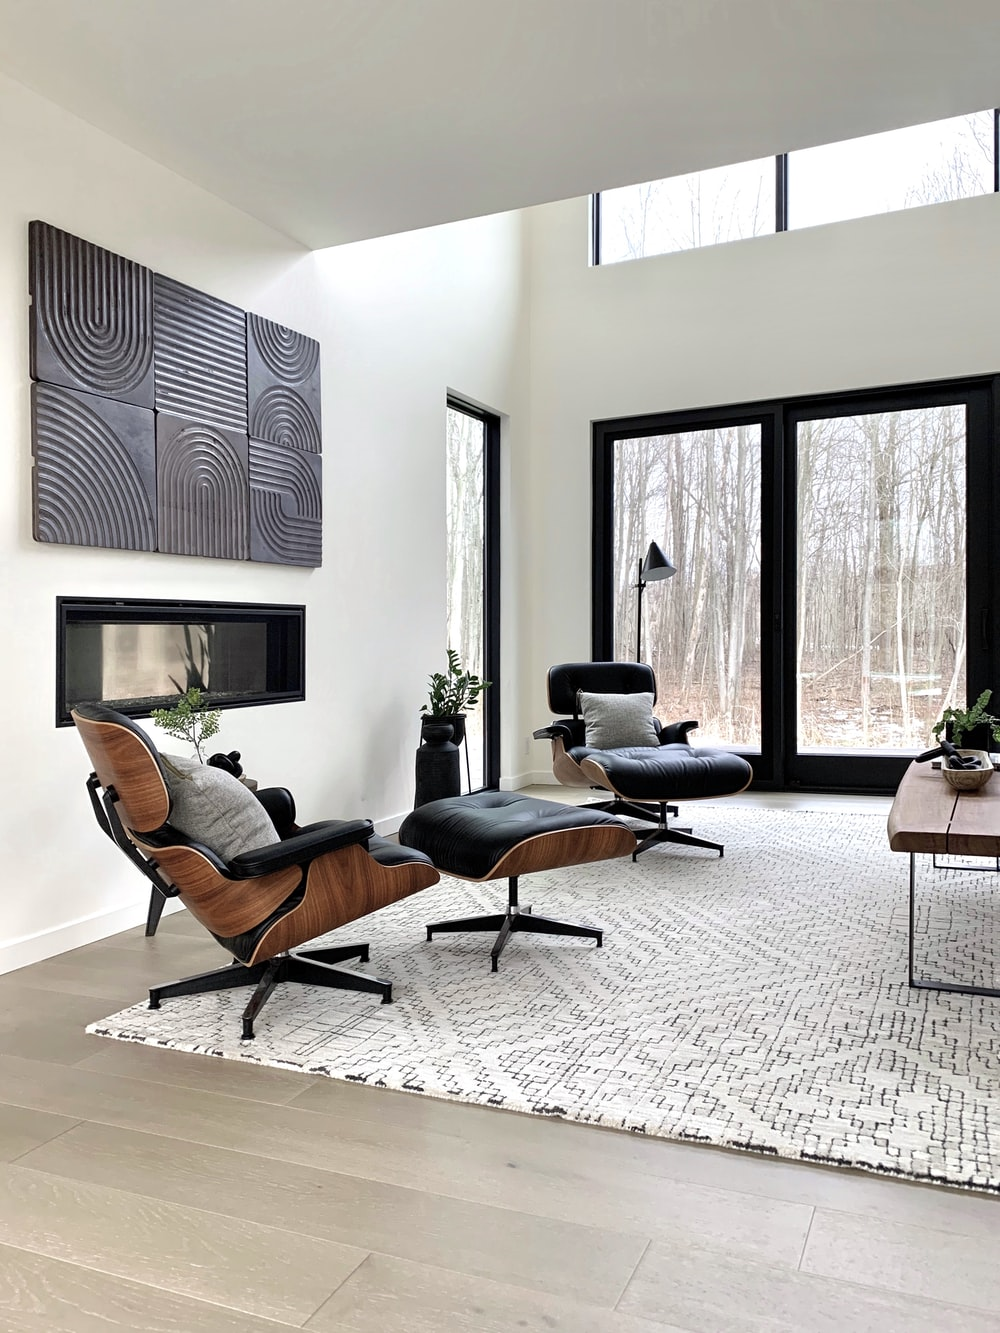 black leather padded armchair near black wooden framed glass window